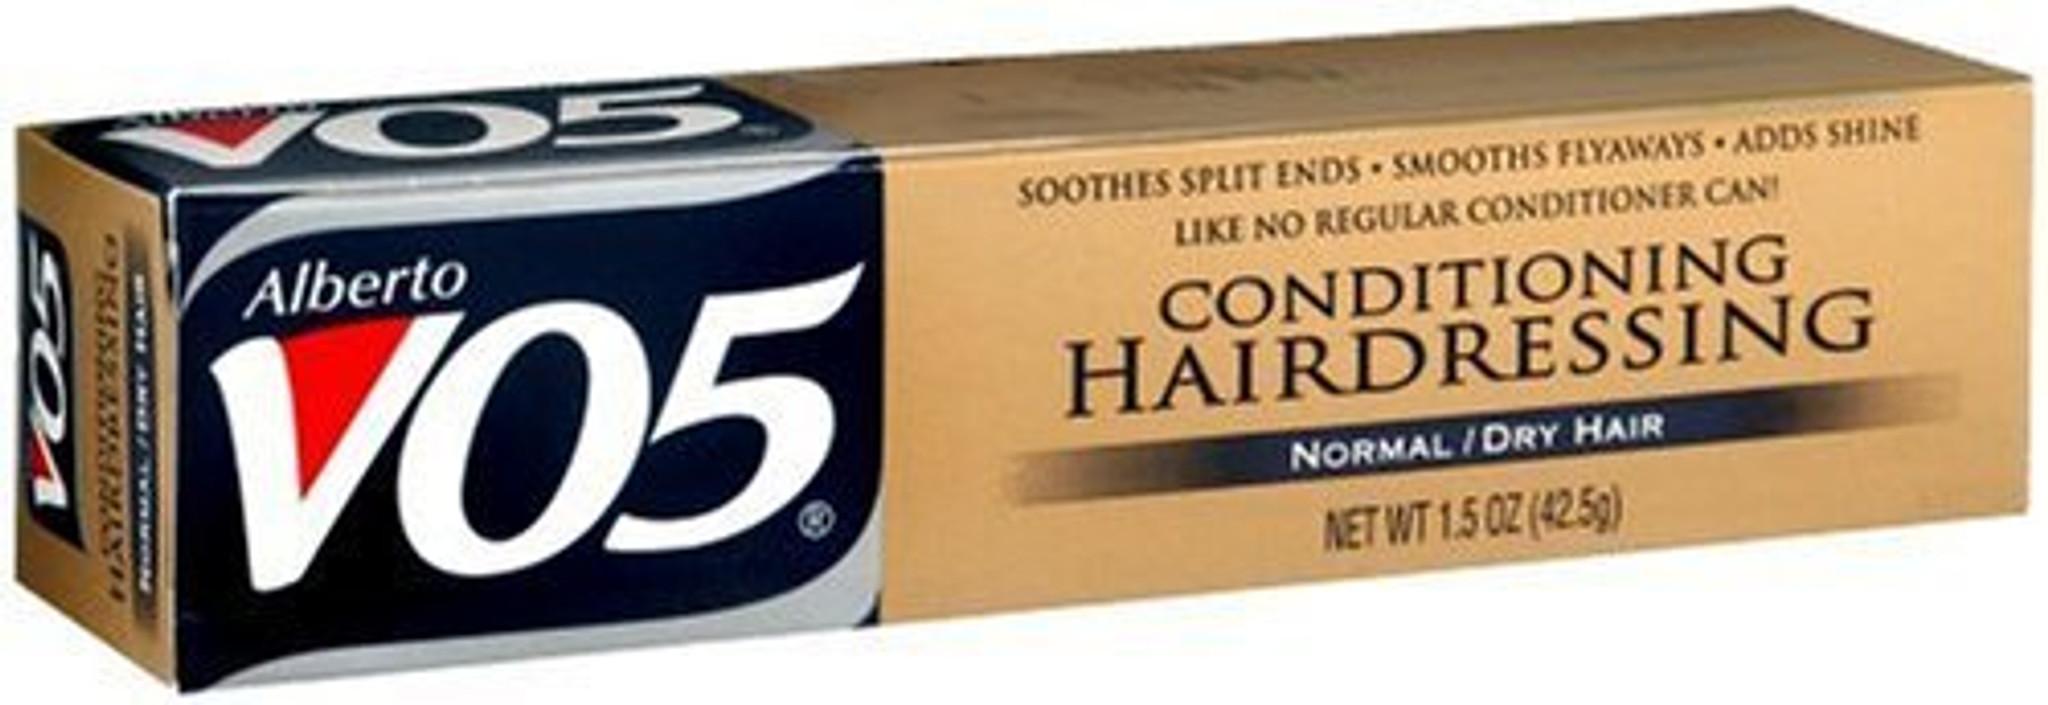 Alberto VO5 Hairdressing for Normal & Dry Hair 1.5 Oz